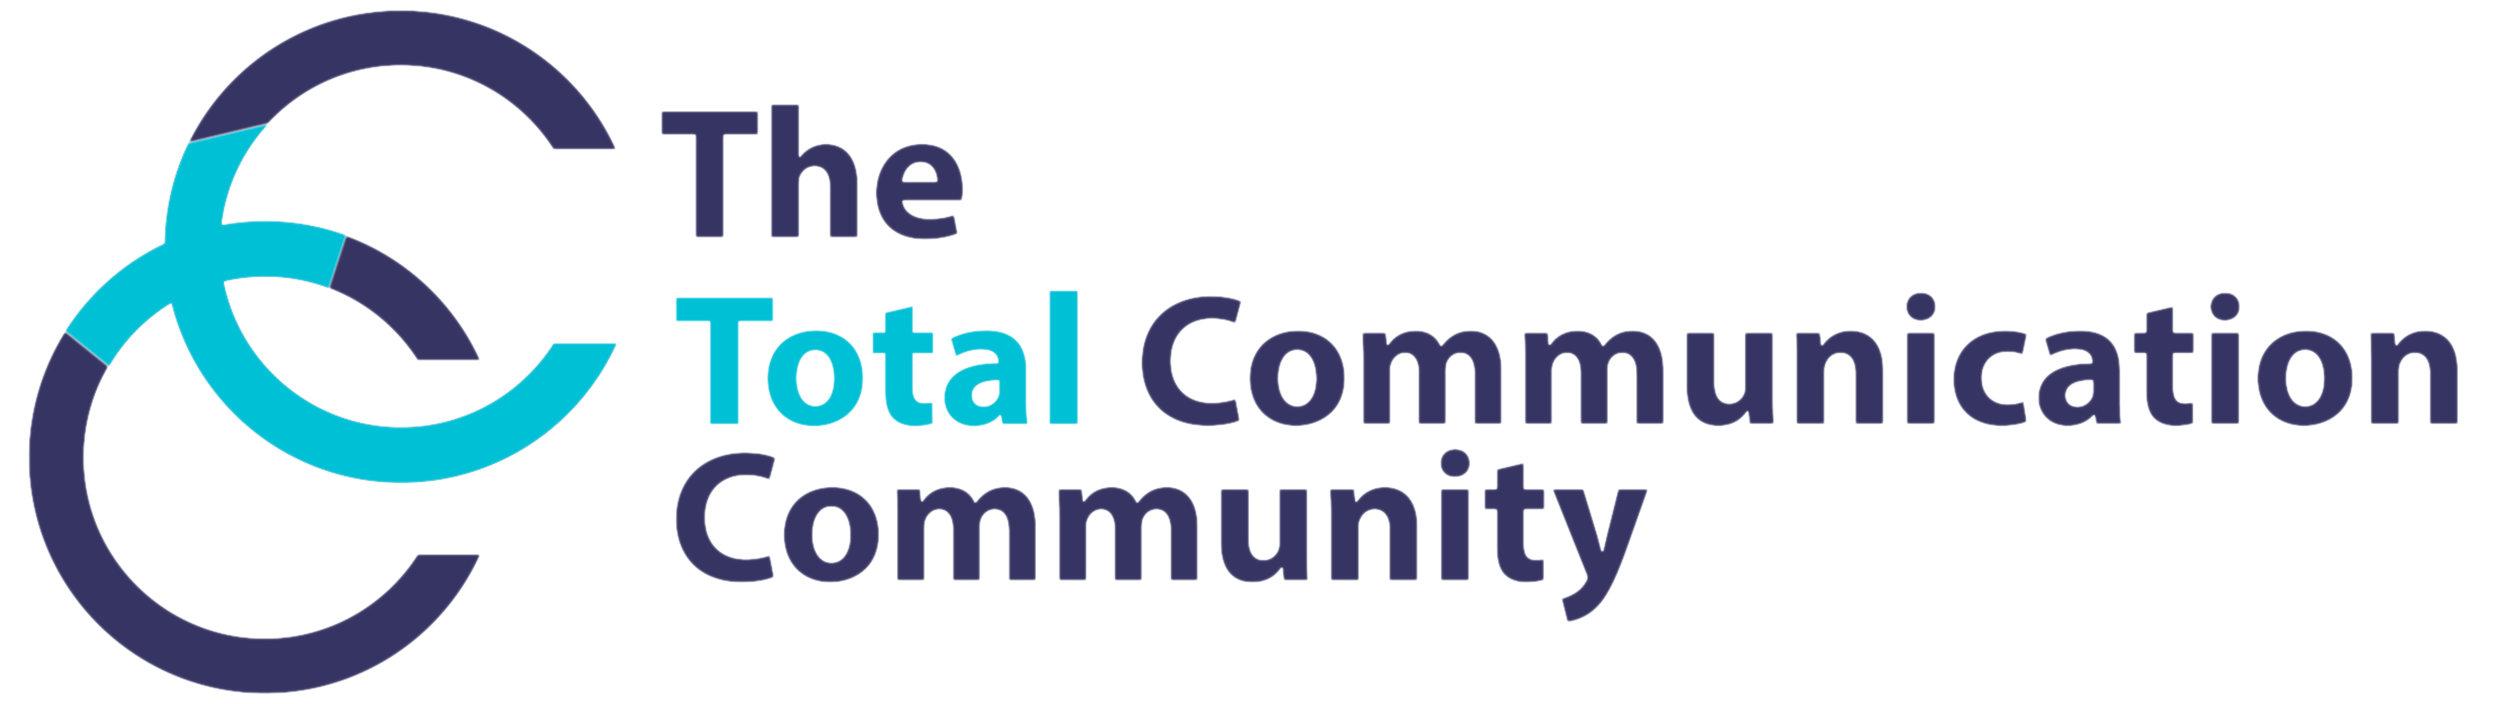 TC CIC Logo.jpg